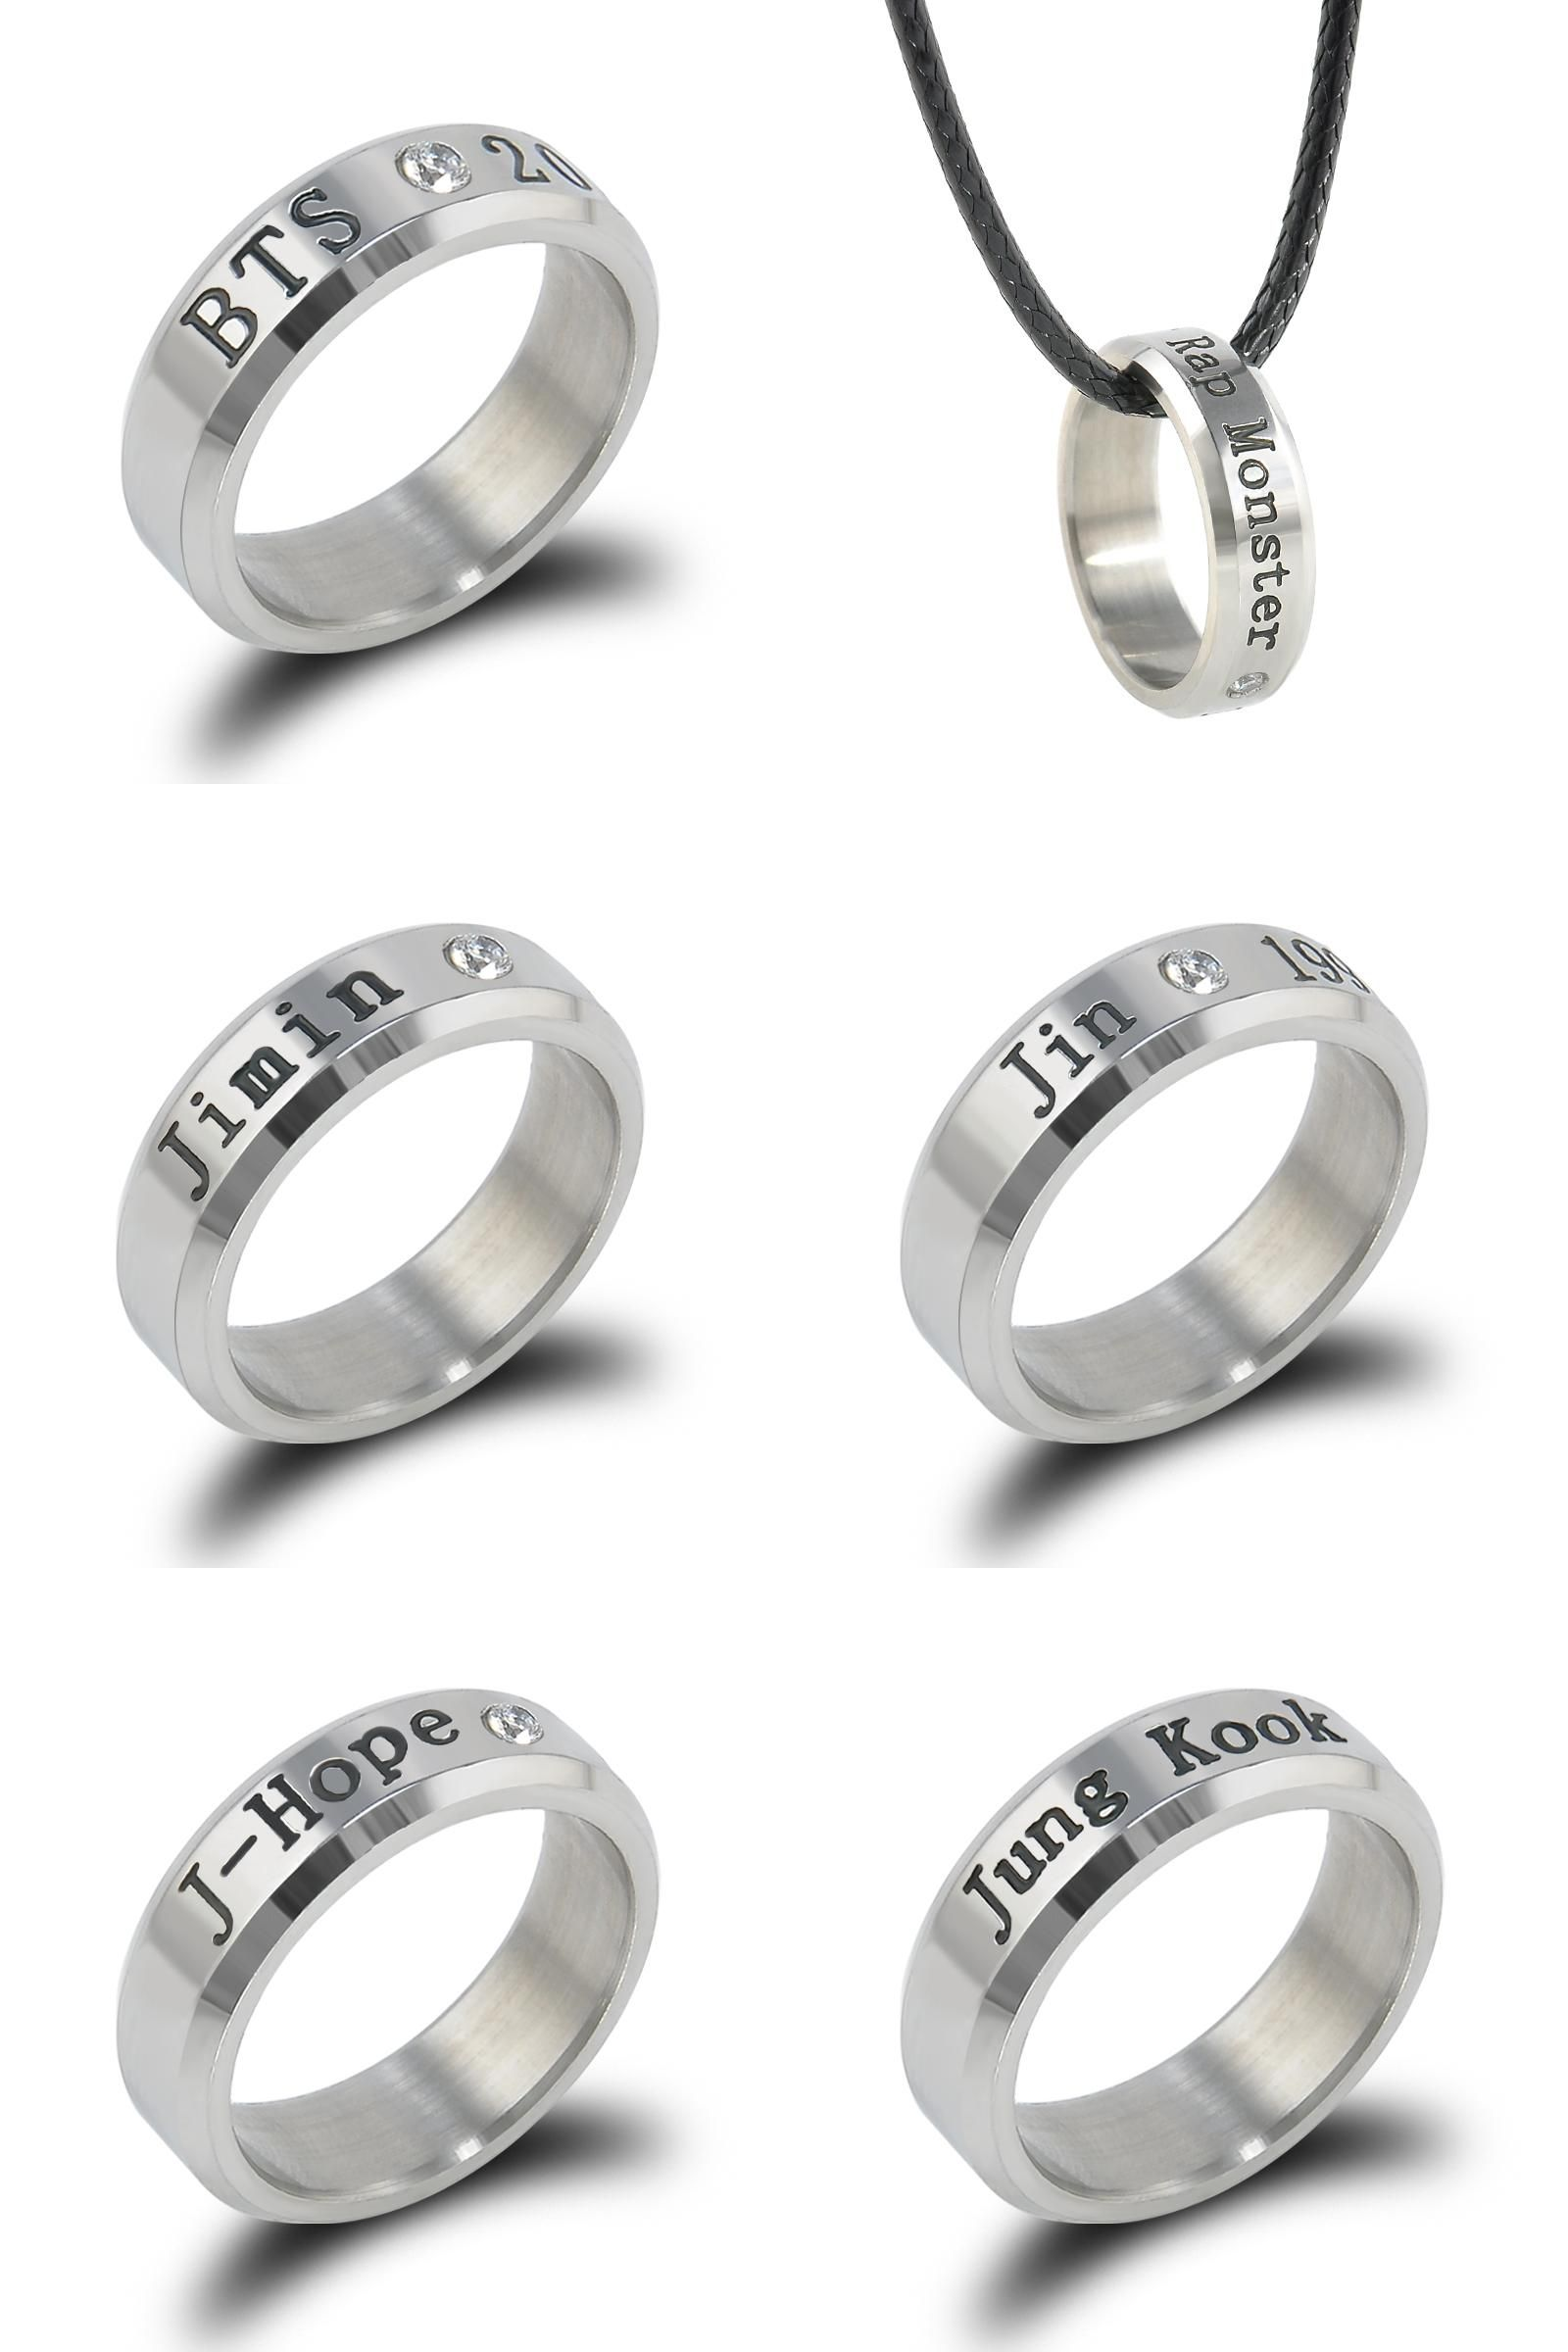 Visit to Buy] BANGTAN BOYS BTS Ring Men Women Stainless Steel KPOP